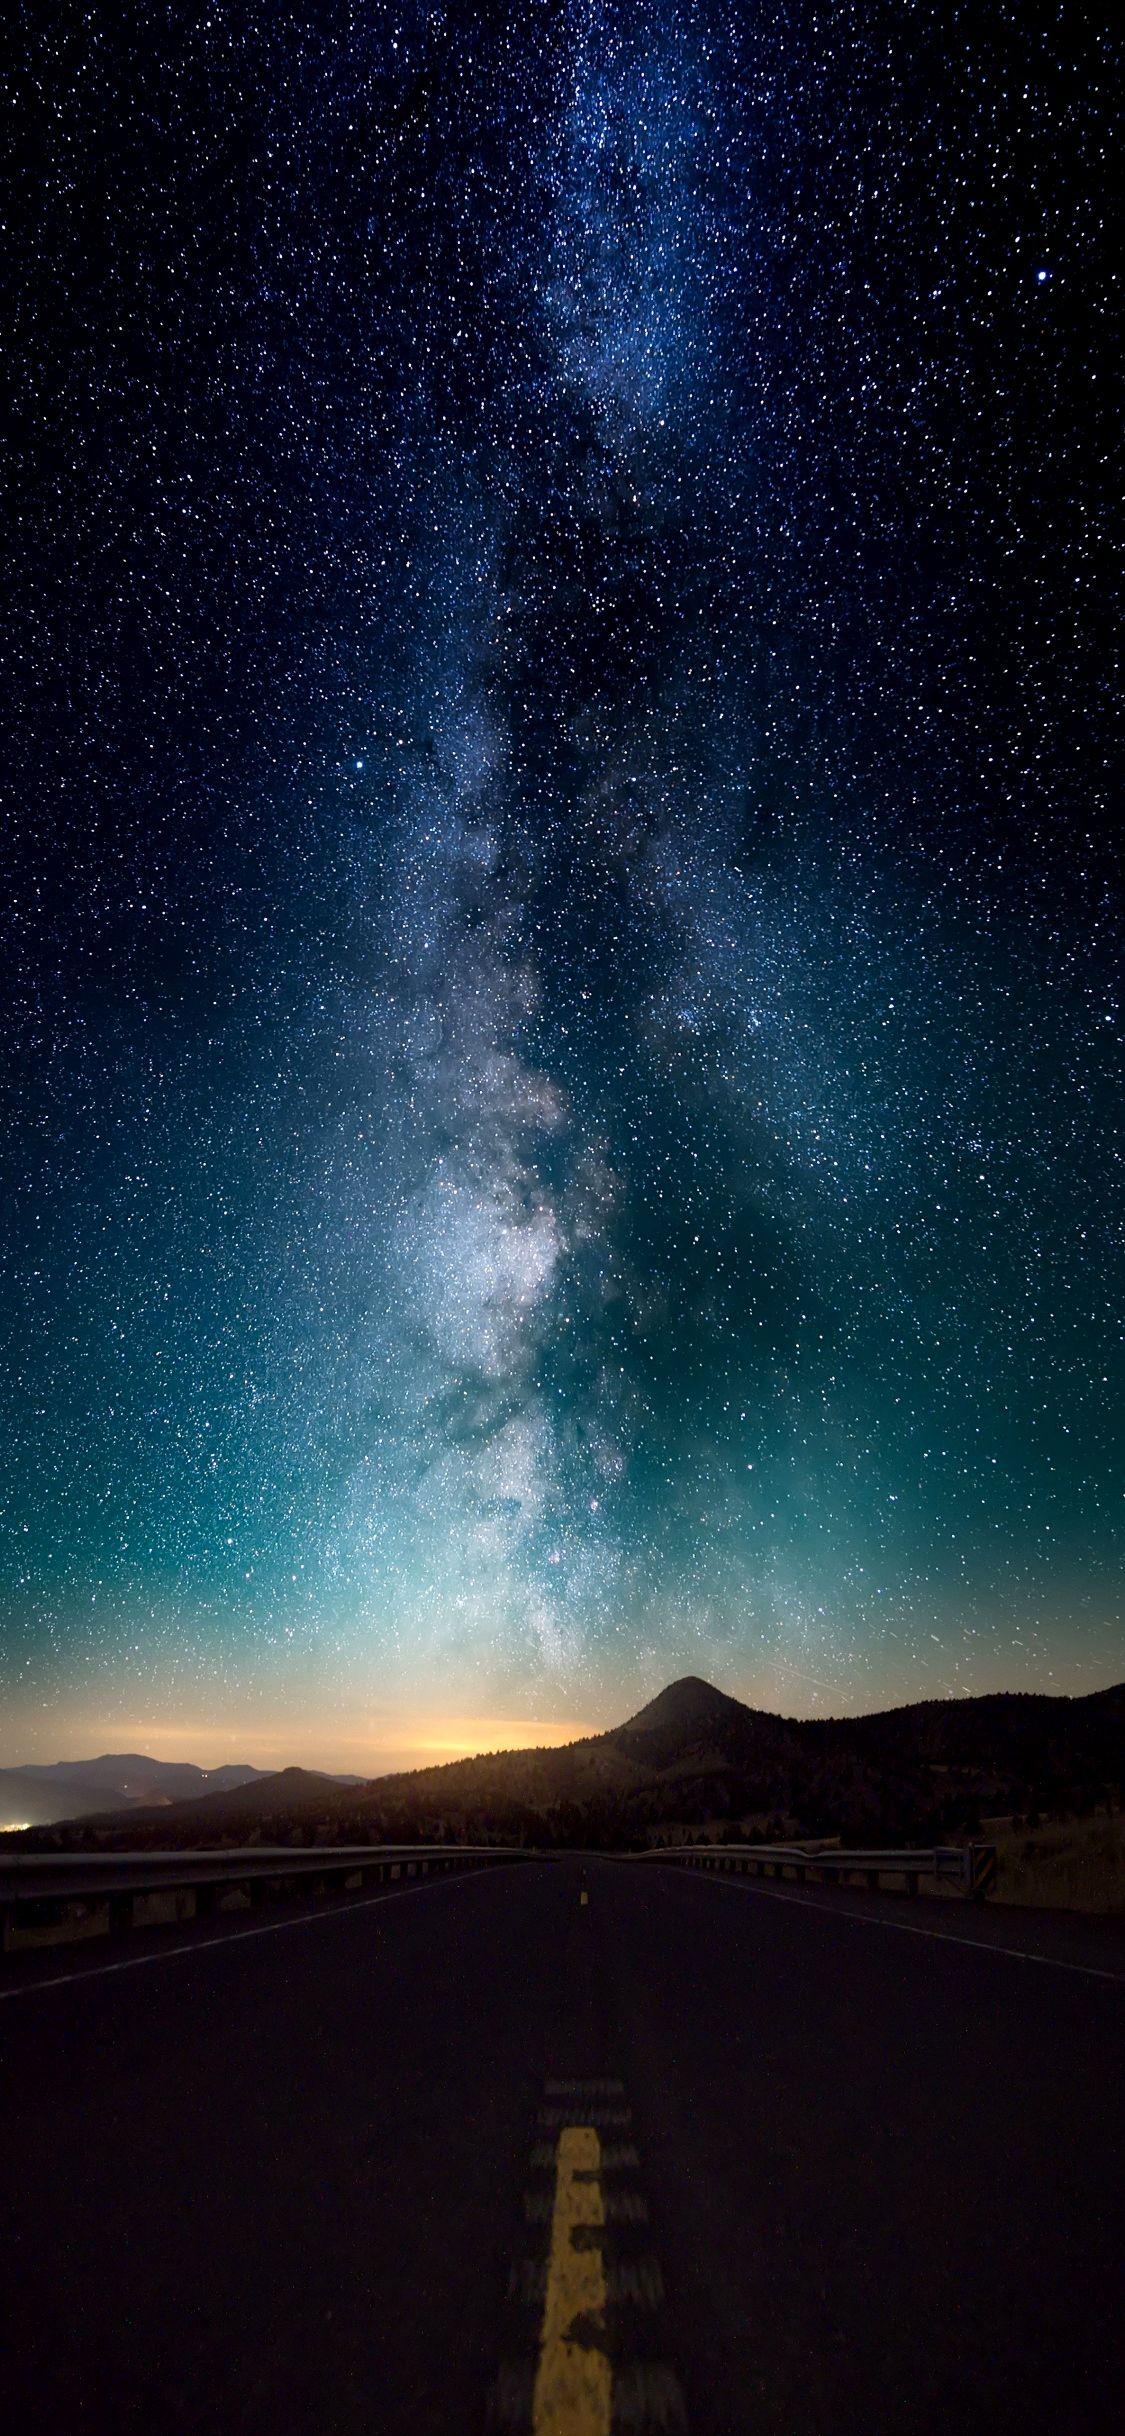 Milky Way Wallpaper 4k Mobile Trick Iphone Wallpaper Night Sky Starry Night Wallpaper Night Sky Wallpaper